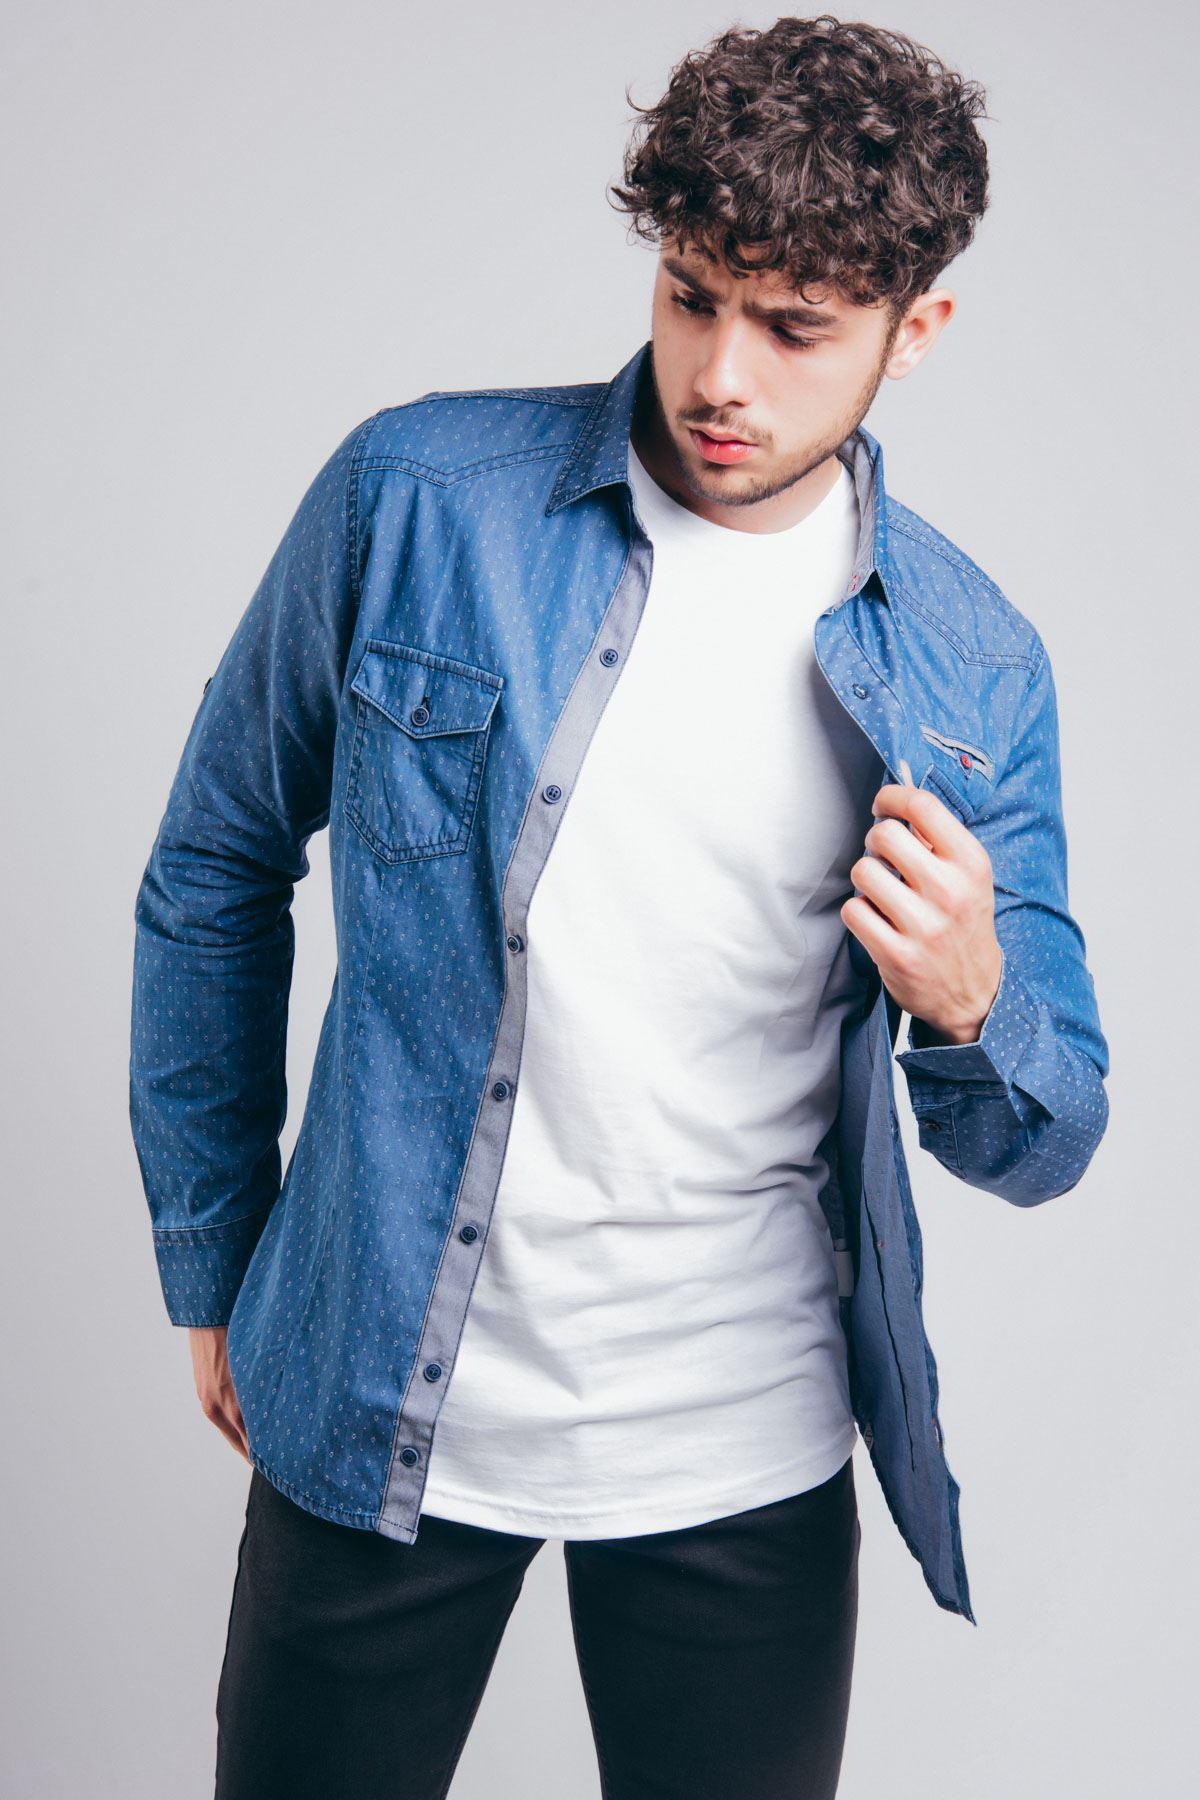 Pitikare Cep Detay Mavi Erkek Kot Gömlek